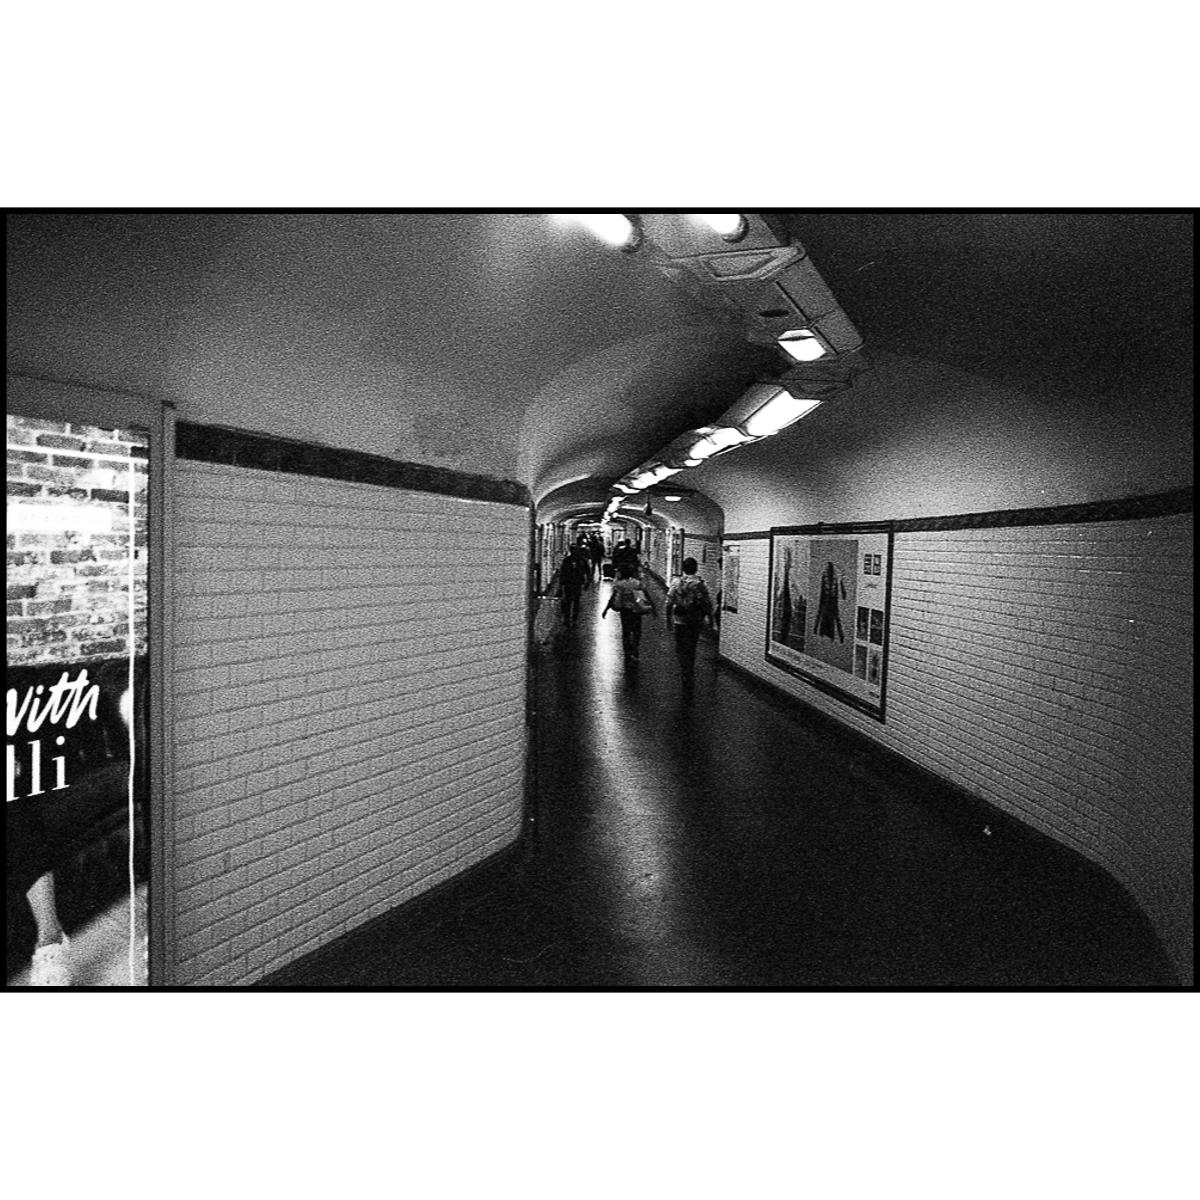 paris file-020.jpg